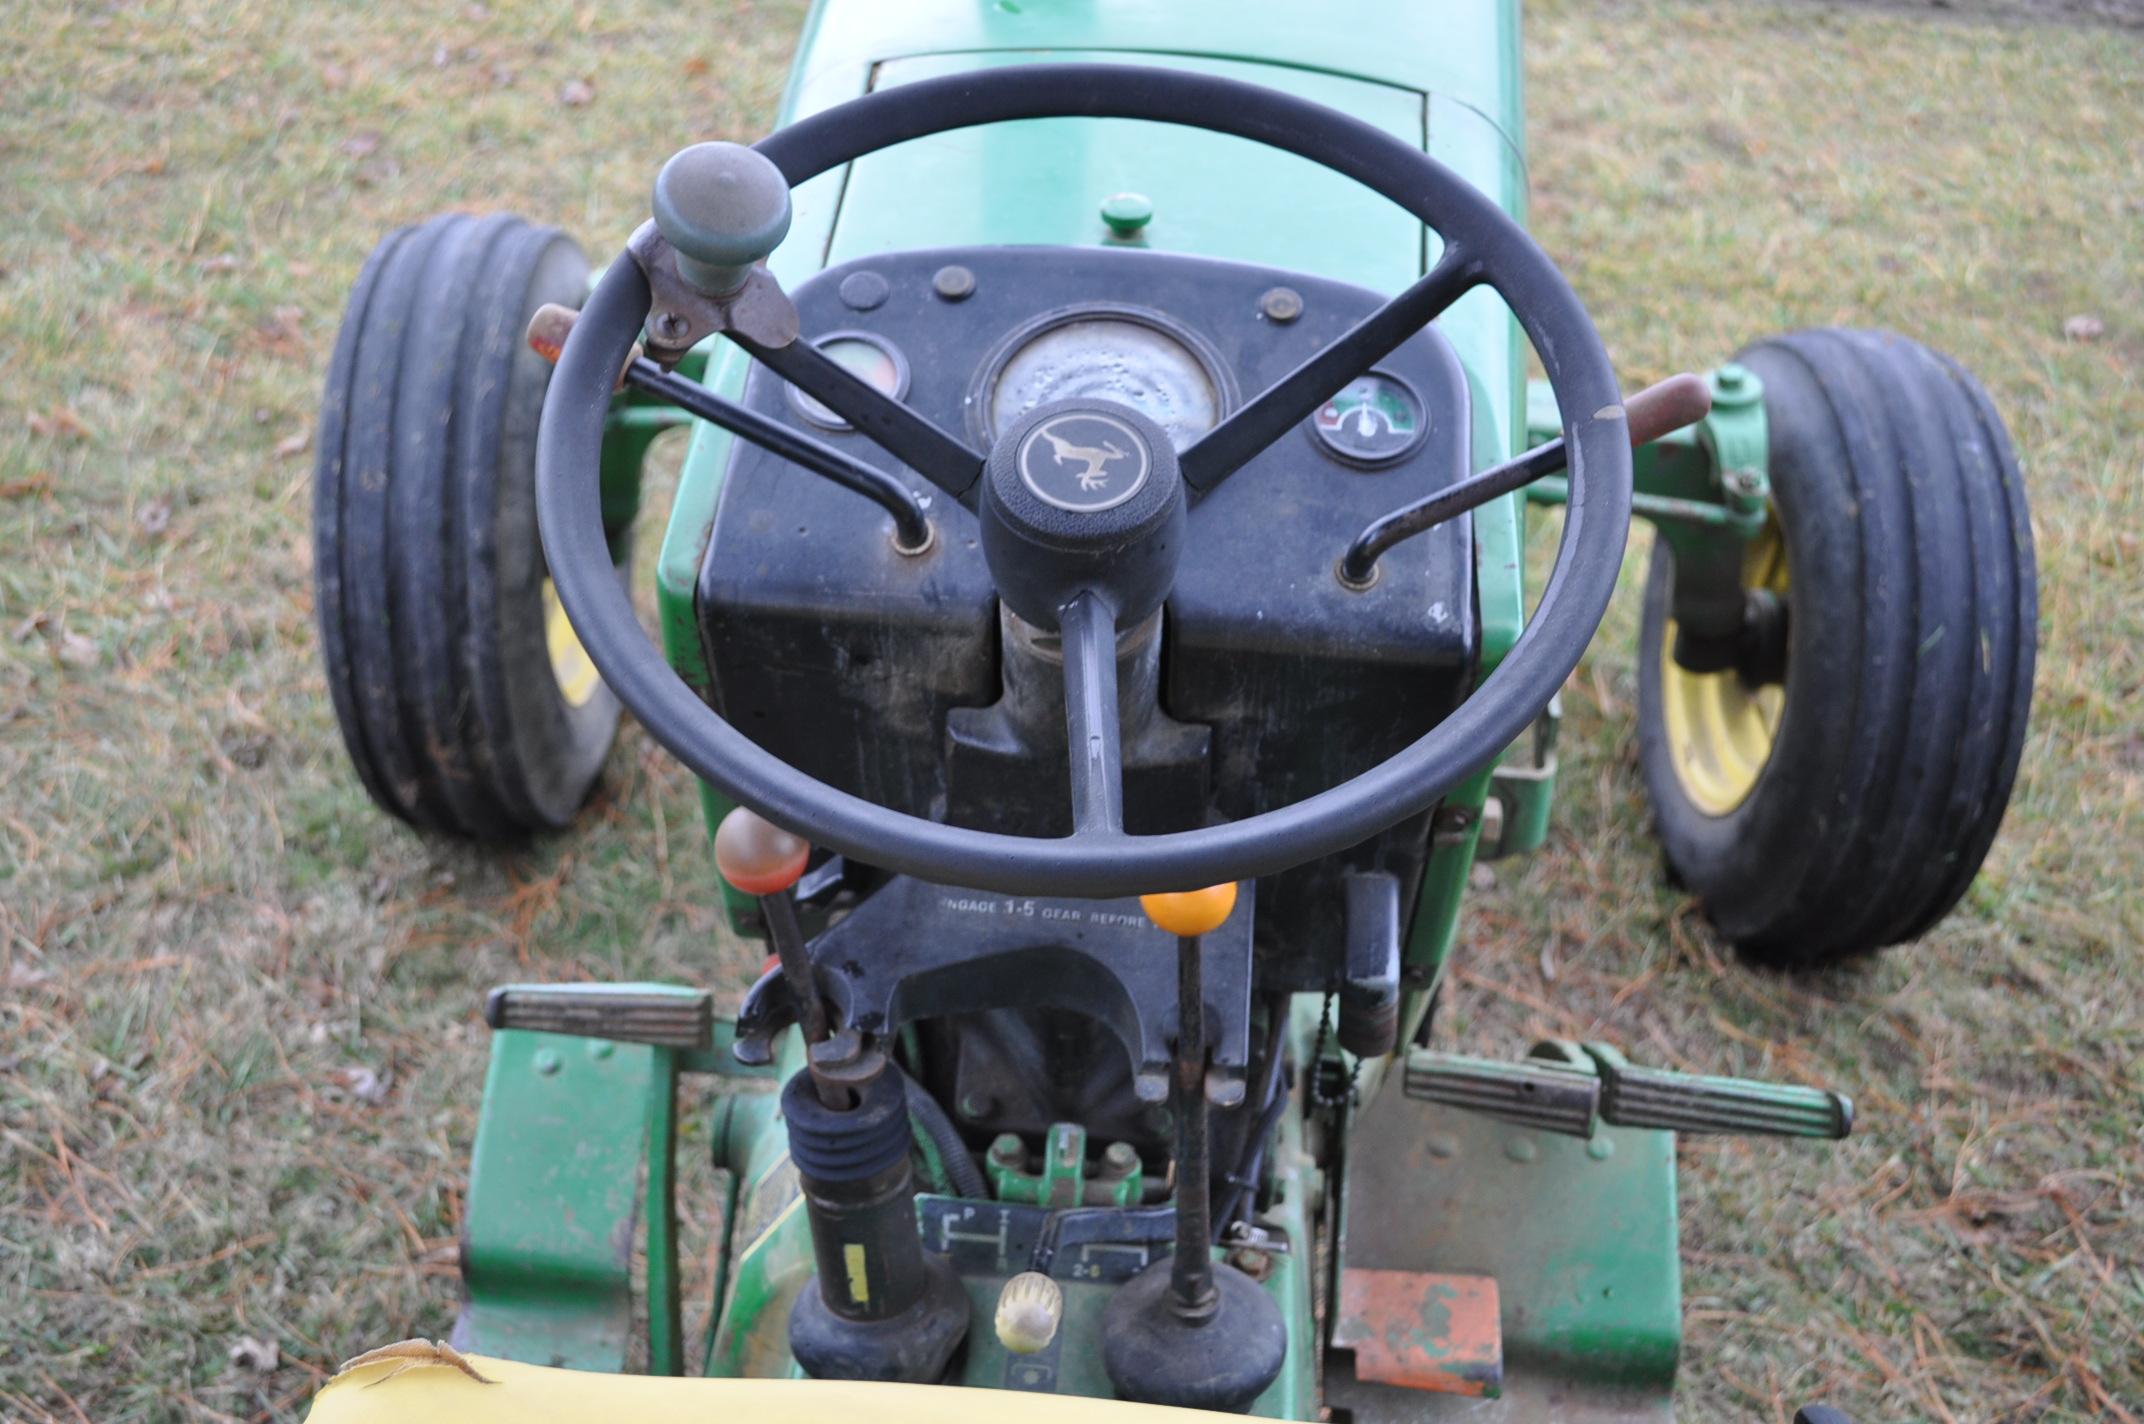 John Deere 2630 tractor, diesel, 16.9-28 rear, 9.5-15 front, 1 hyd remote, 540 pto, 3 pt, 4260 - Image 15 of 18